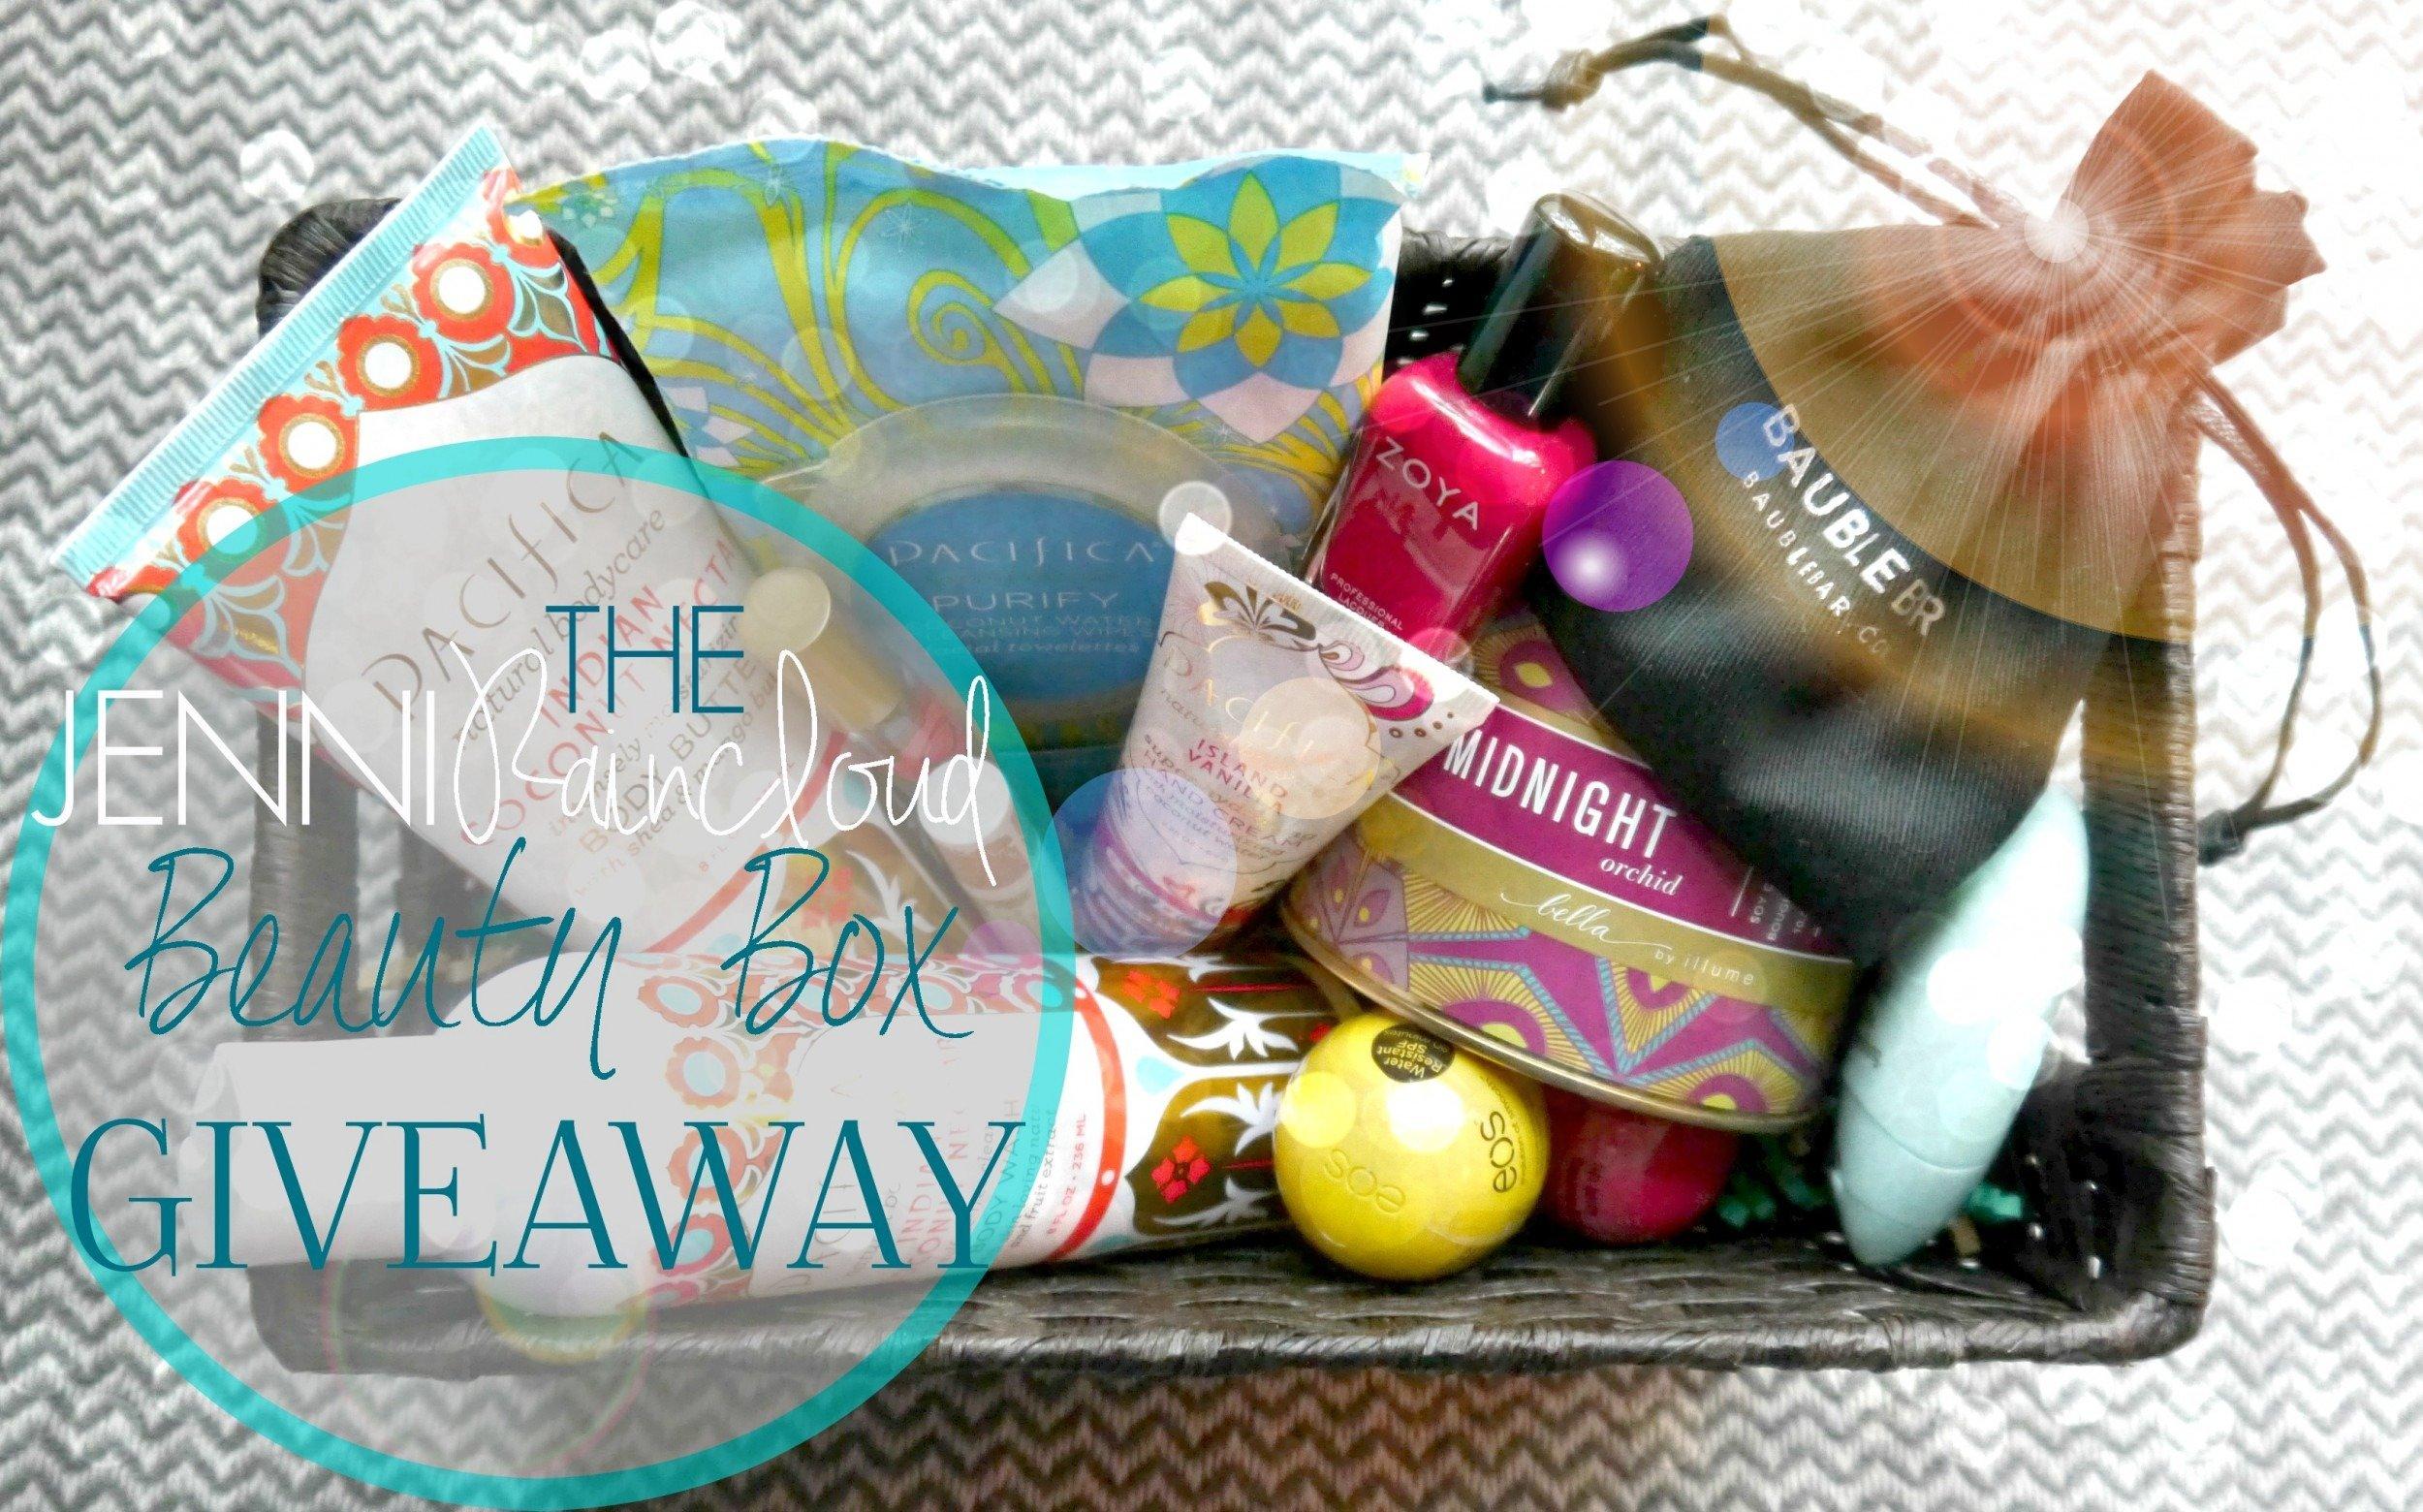 giveaway-basket